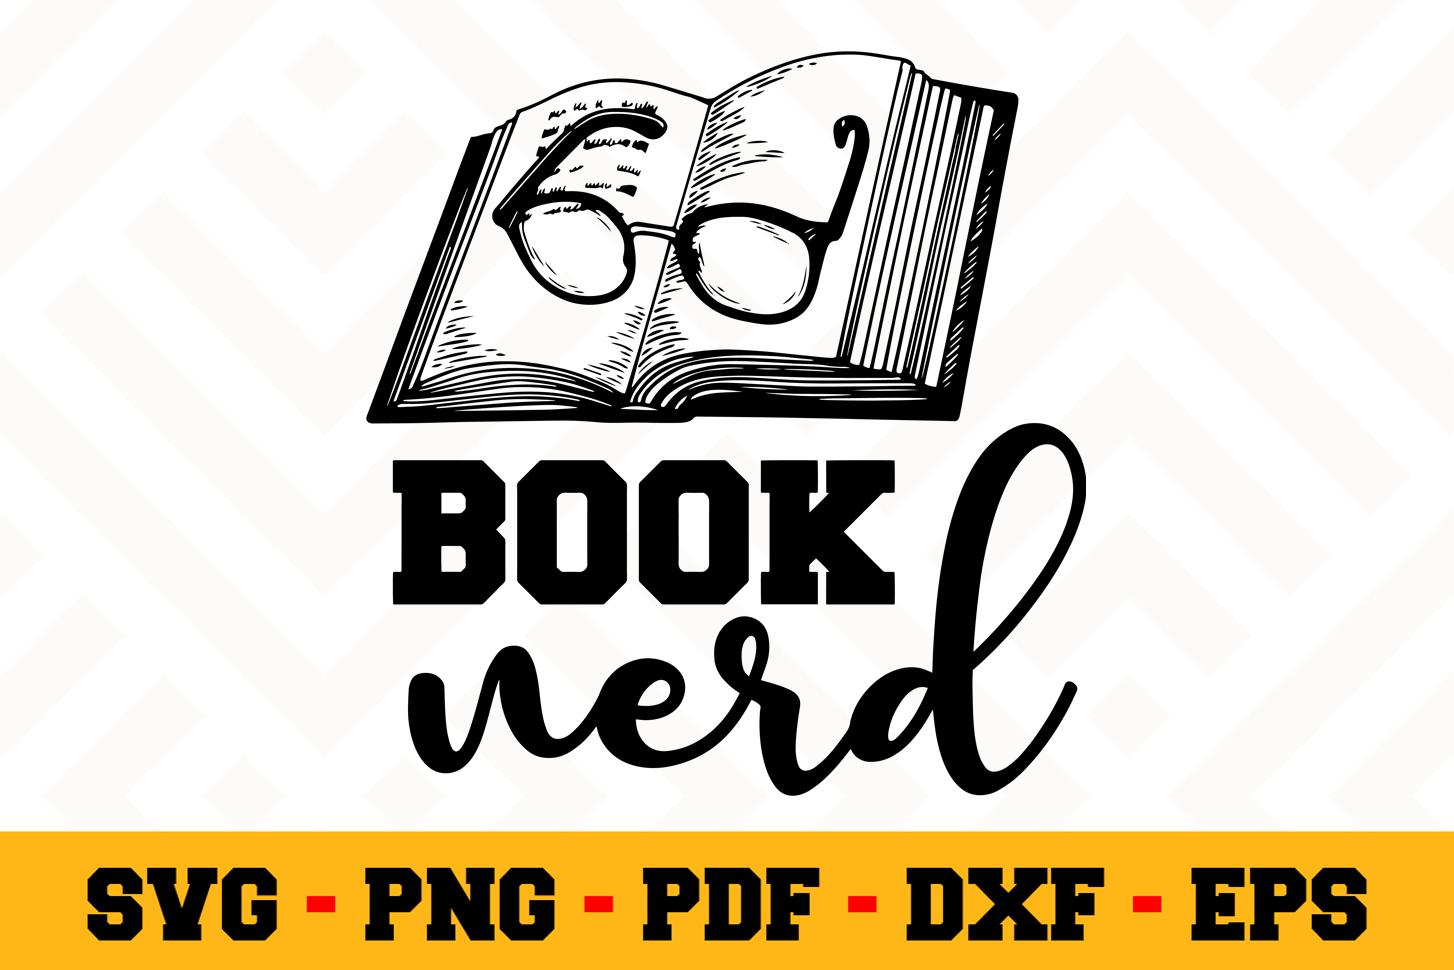 Book Lover SVG Design n617 | Reading SVG Cut File example image 1